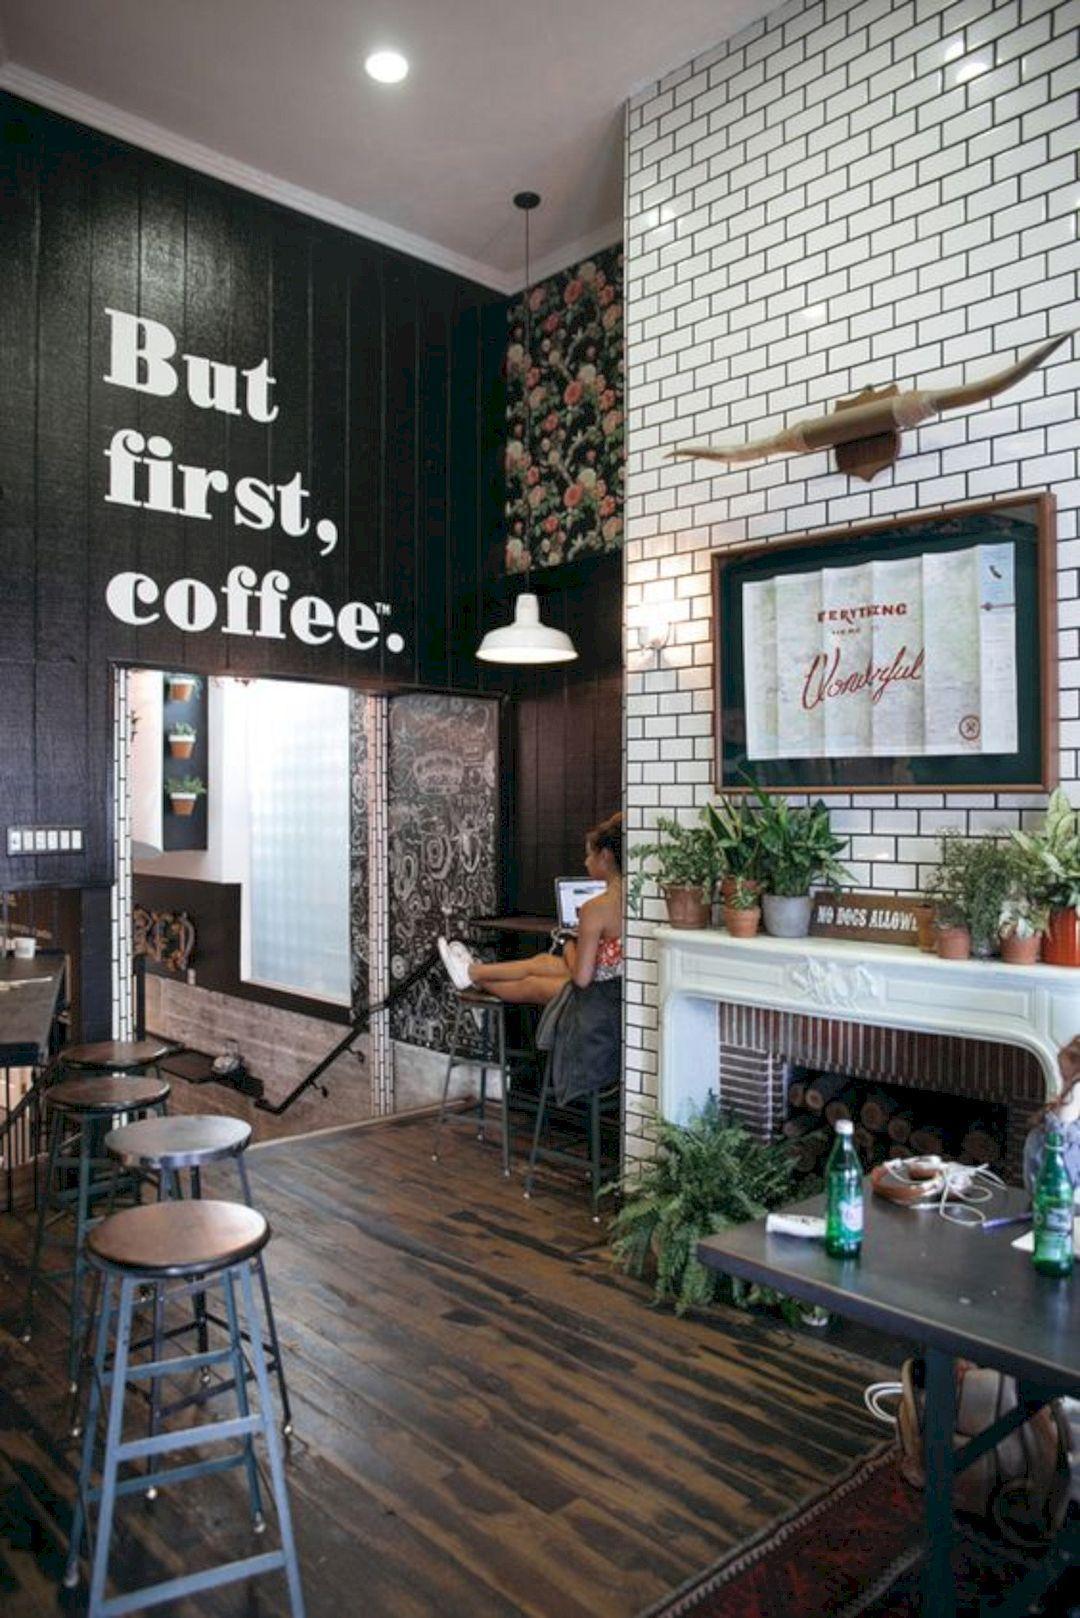 16 Small Cafe Interior Design Ideas Coffee Theme Kitchen Coffee Shop Decor Cafe Interior Design